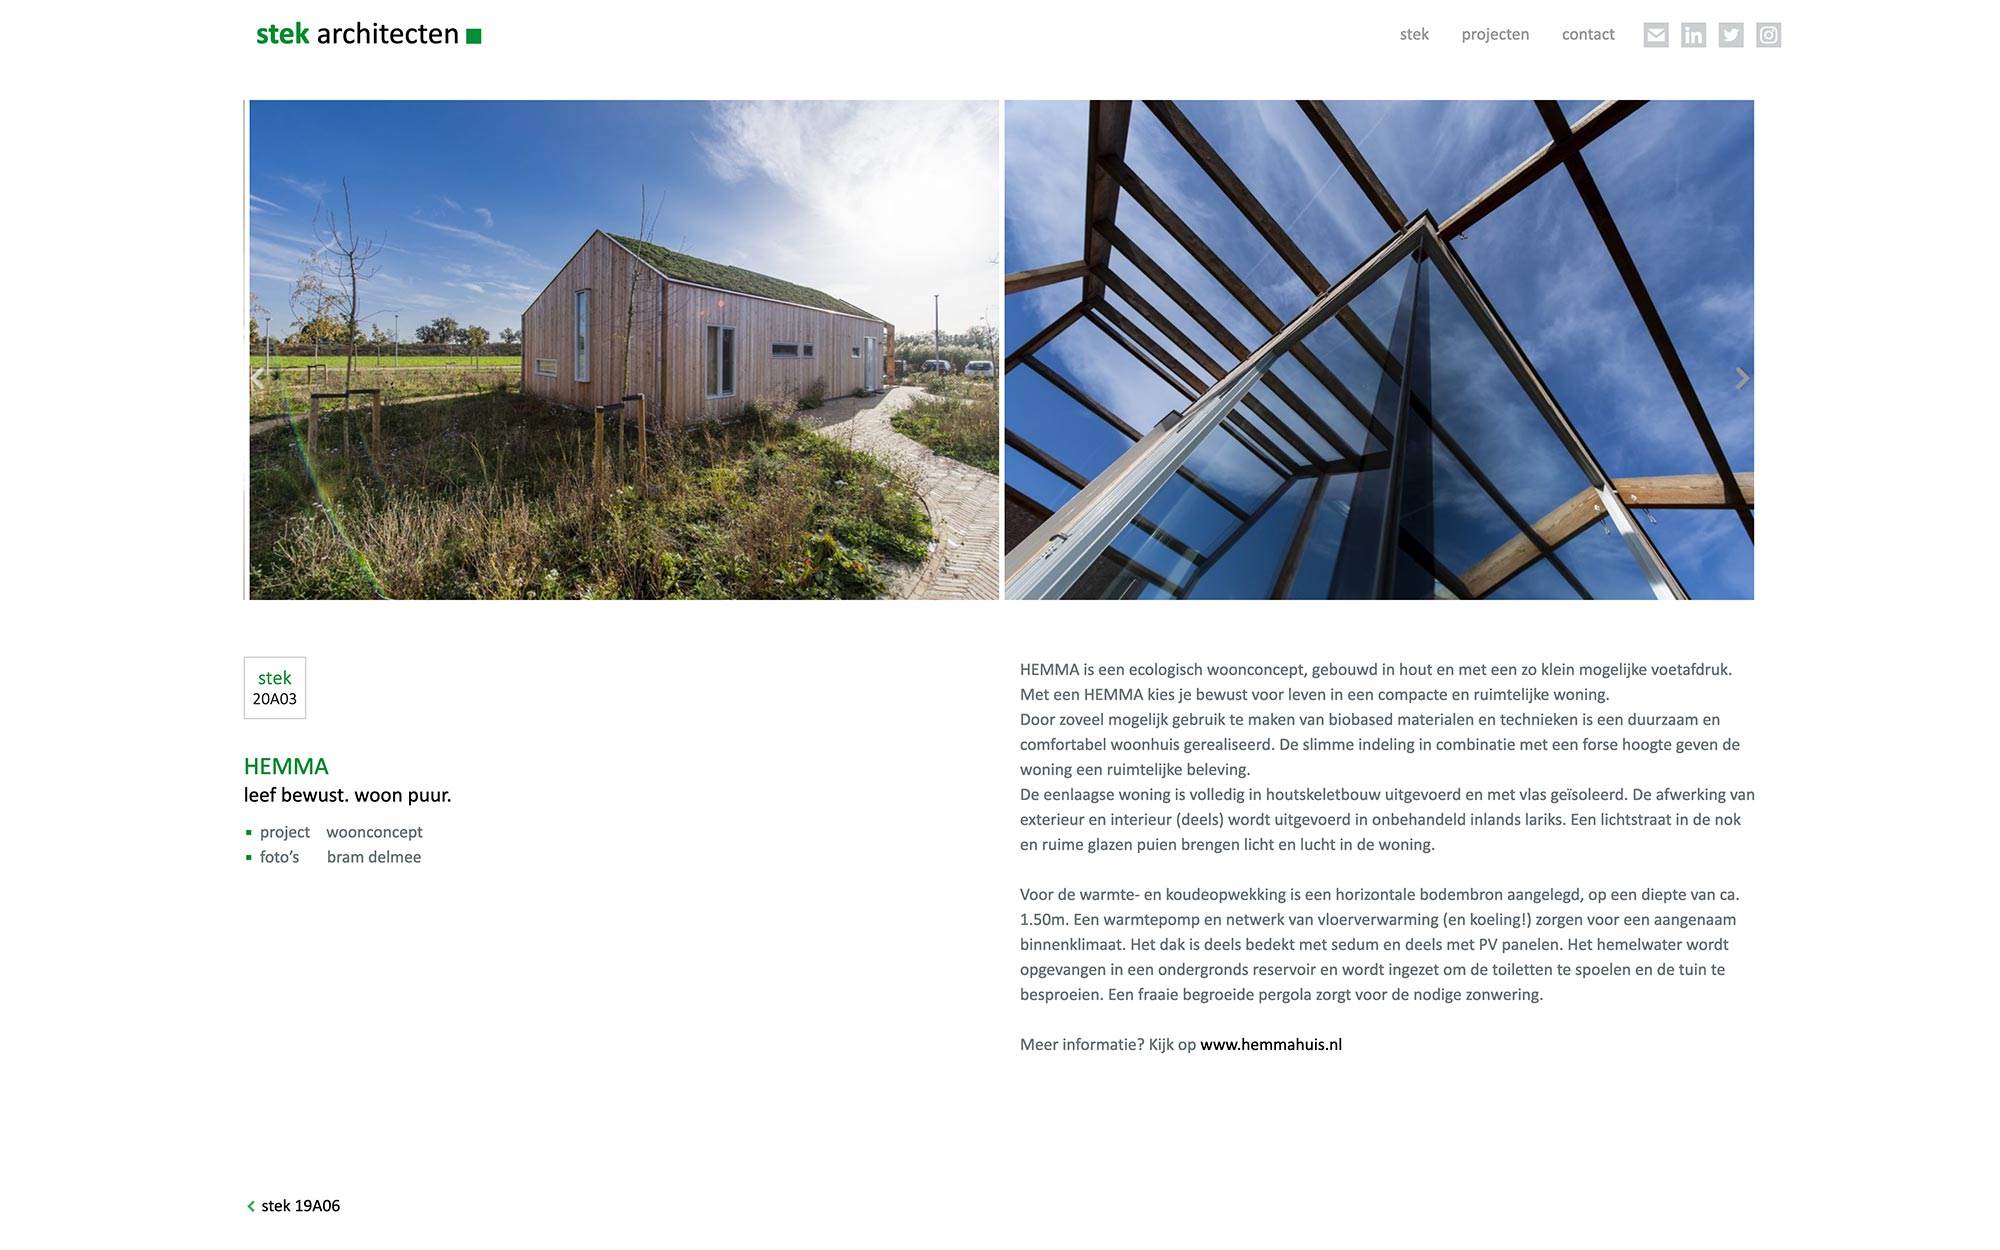 stek architecten website JAgd ontwerp 3